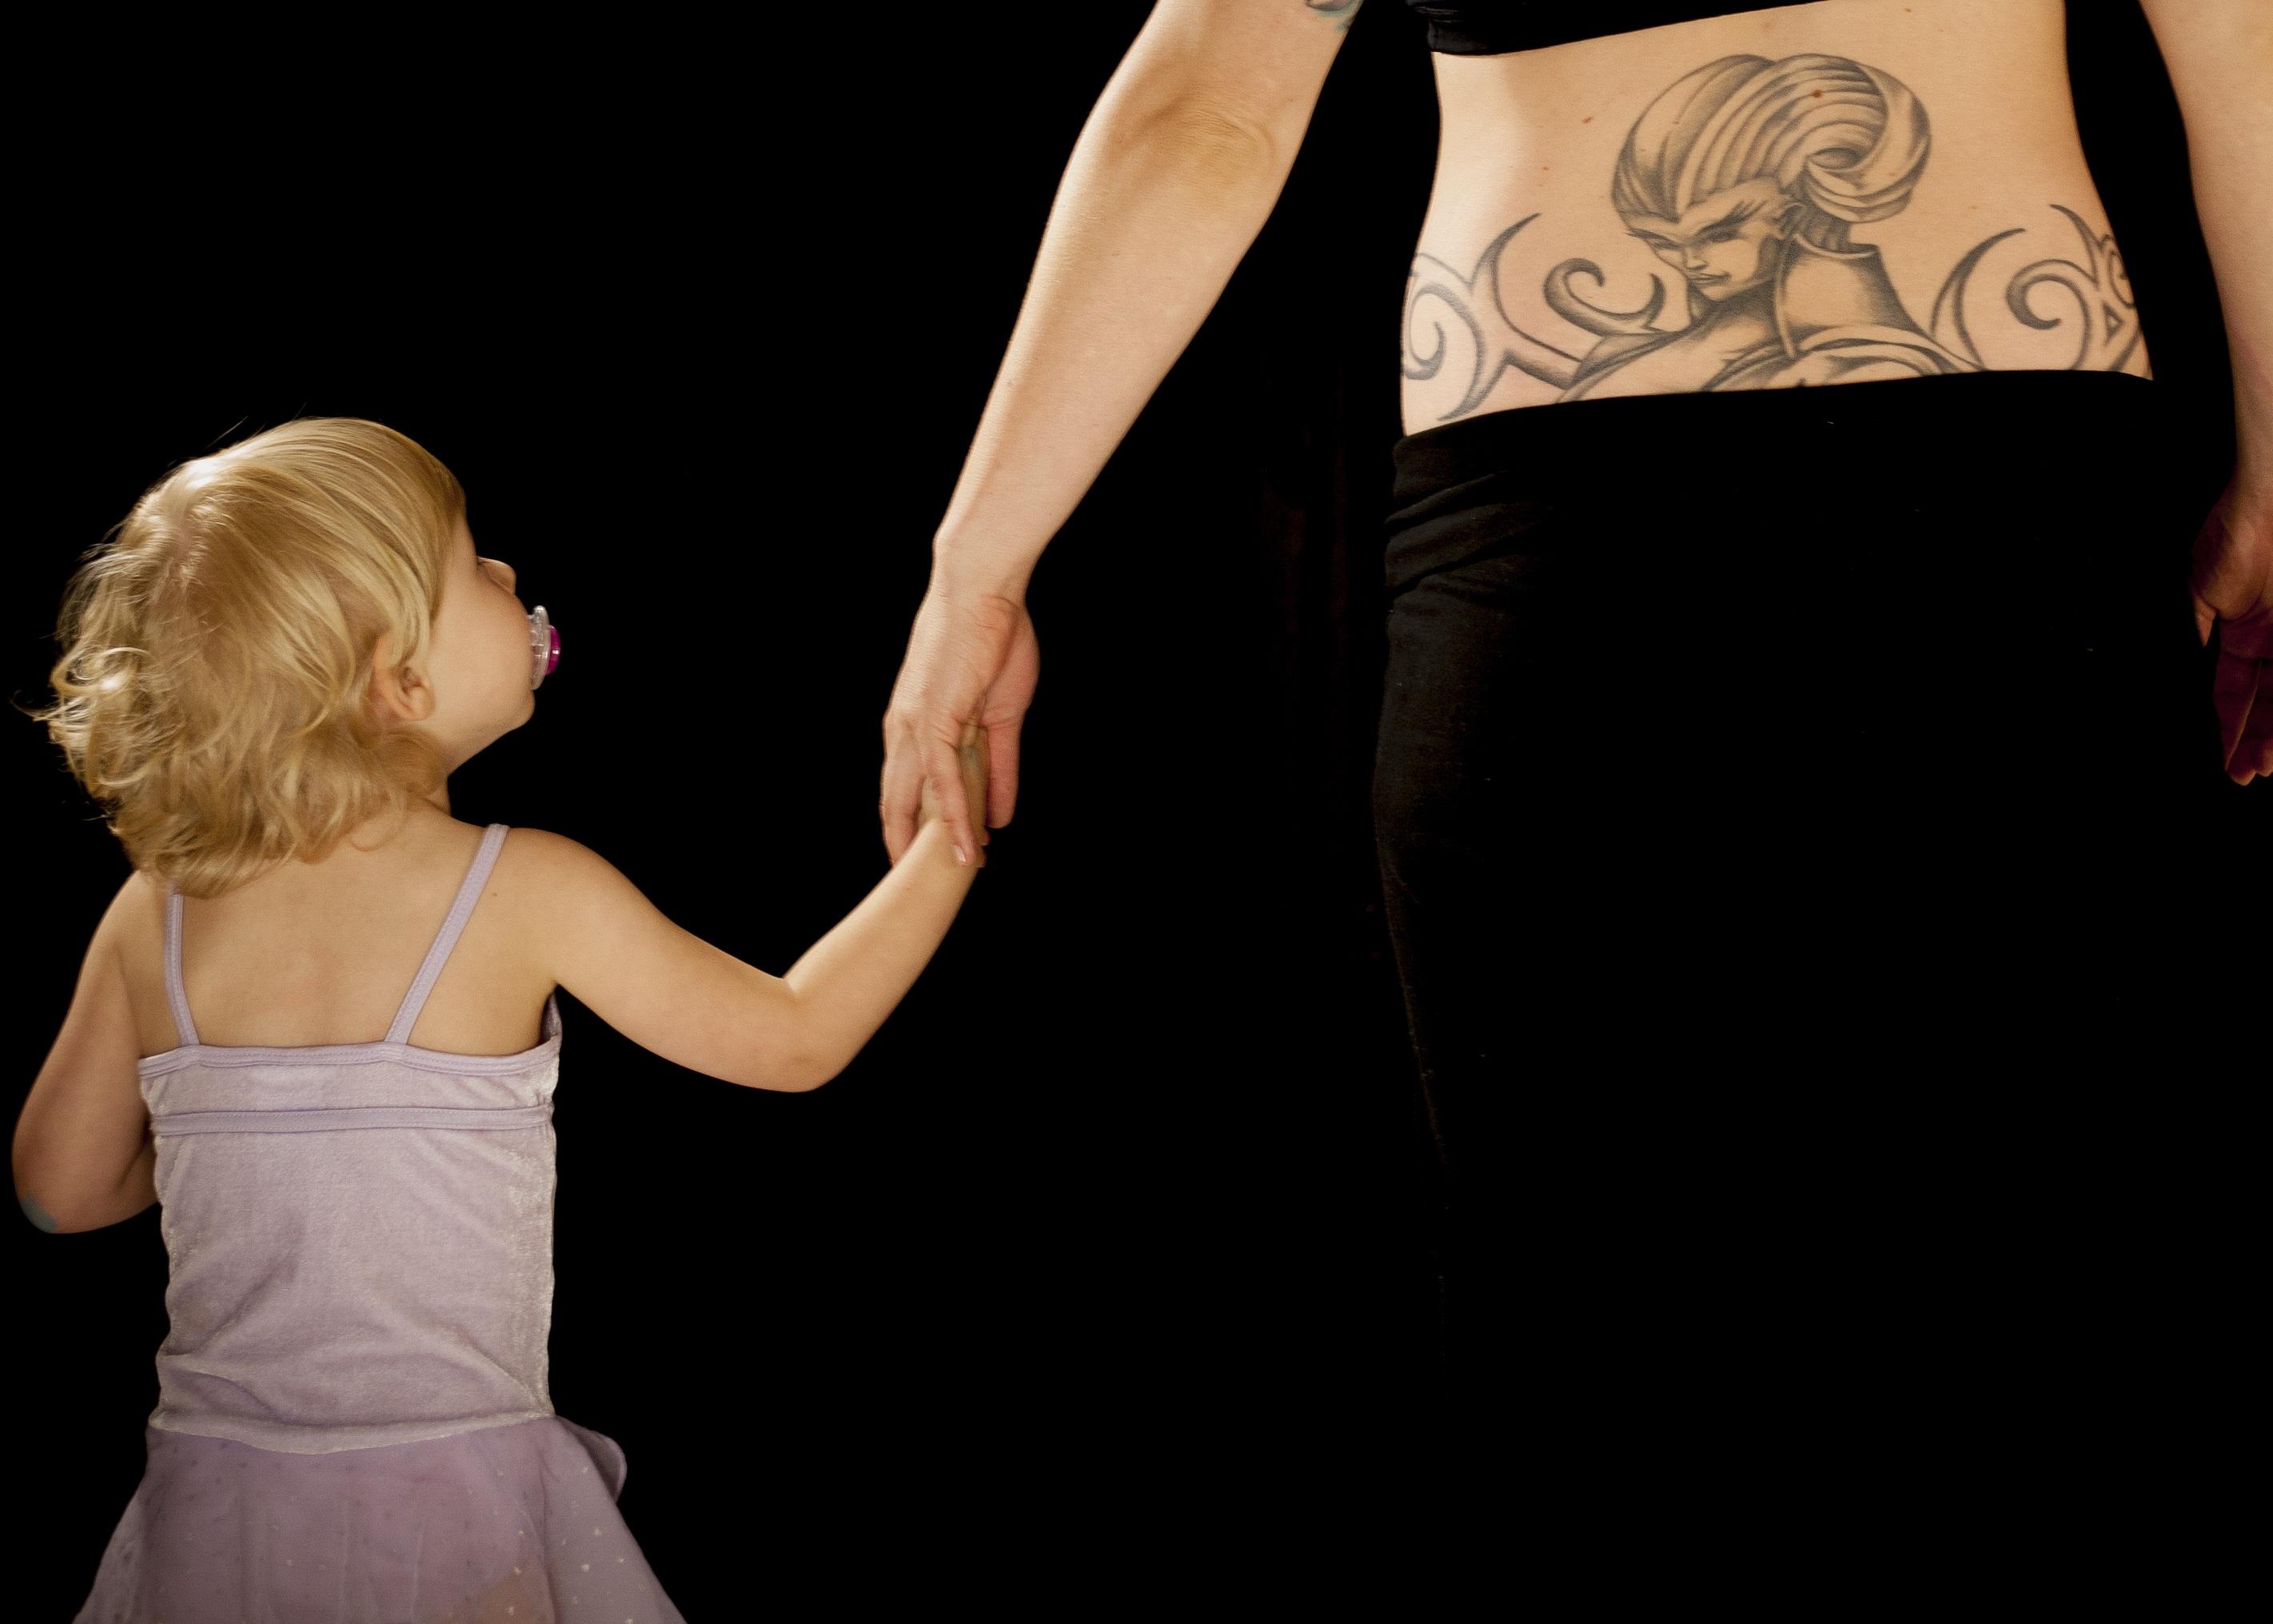 Брюнетка с тату на руке танцует фото 110-689